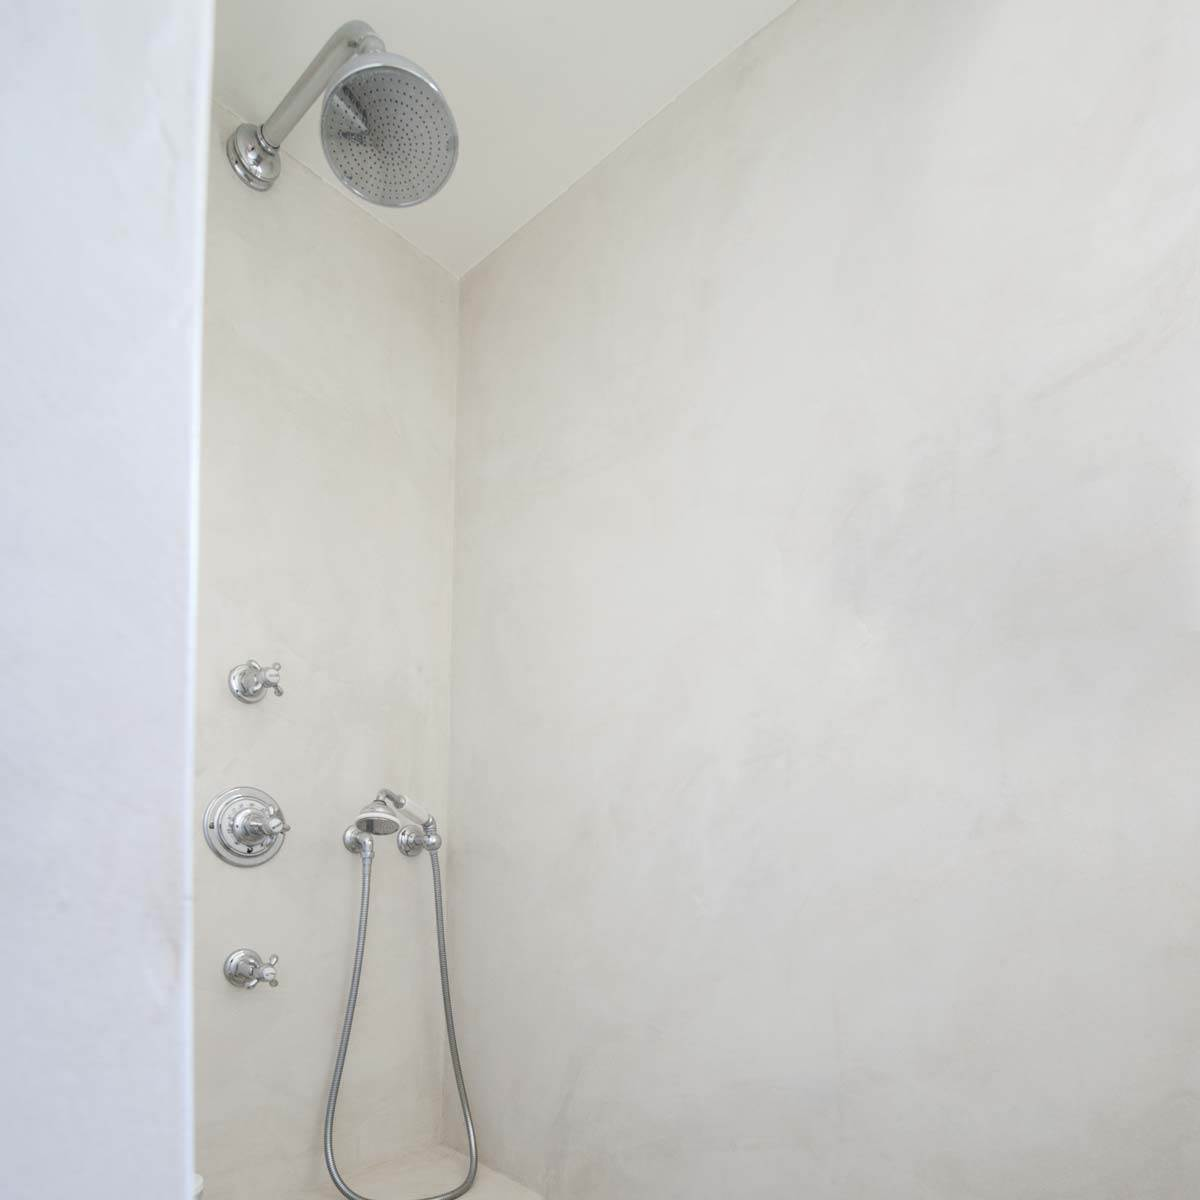 douche de salle de bains en b ton cir kit complet mercadier. Black Bedroom Furniture Sets. Home Design Ideas